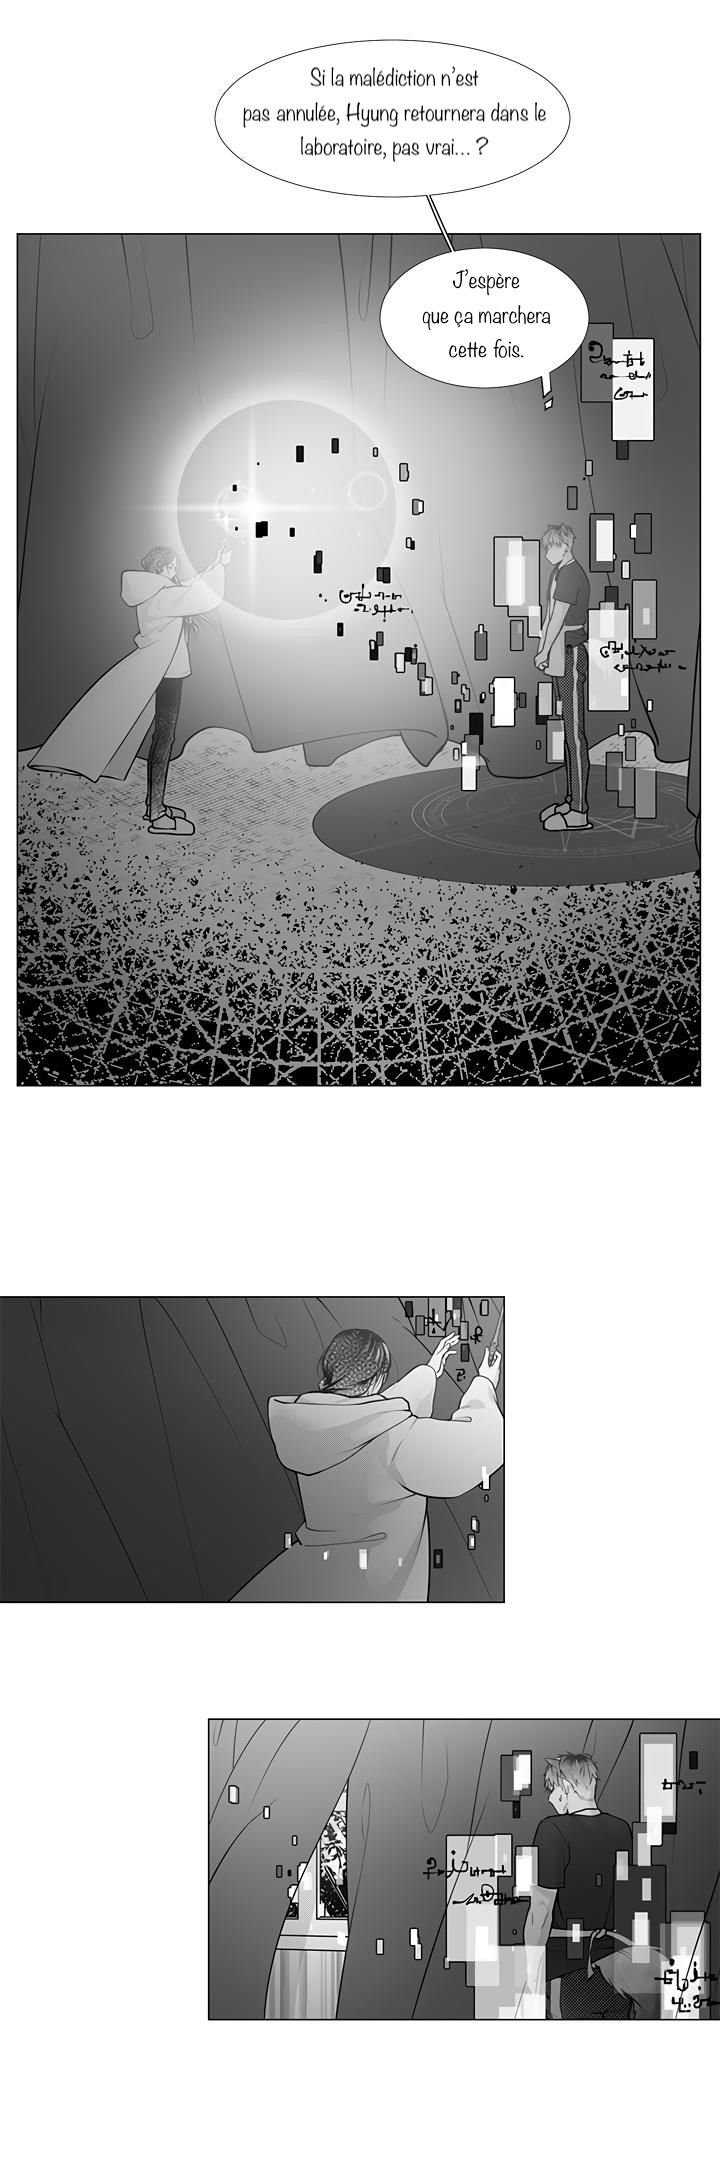 https://nine.mangadogs.com/fr_manga/pic2/59/11515/529551/TheWizardandtheNEETChapitr_3_46.jpg Page 4